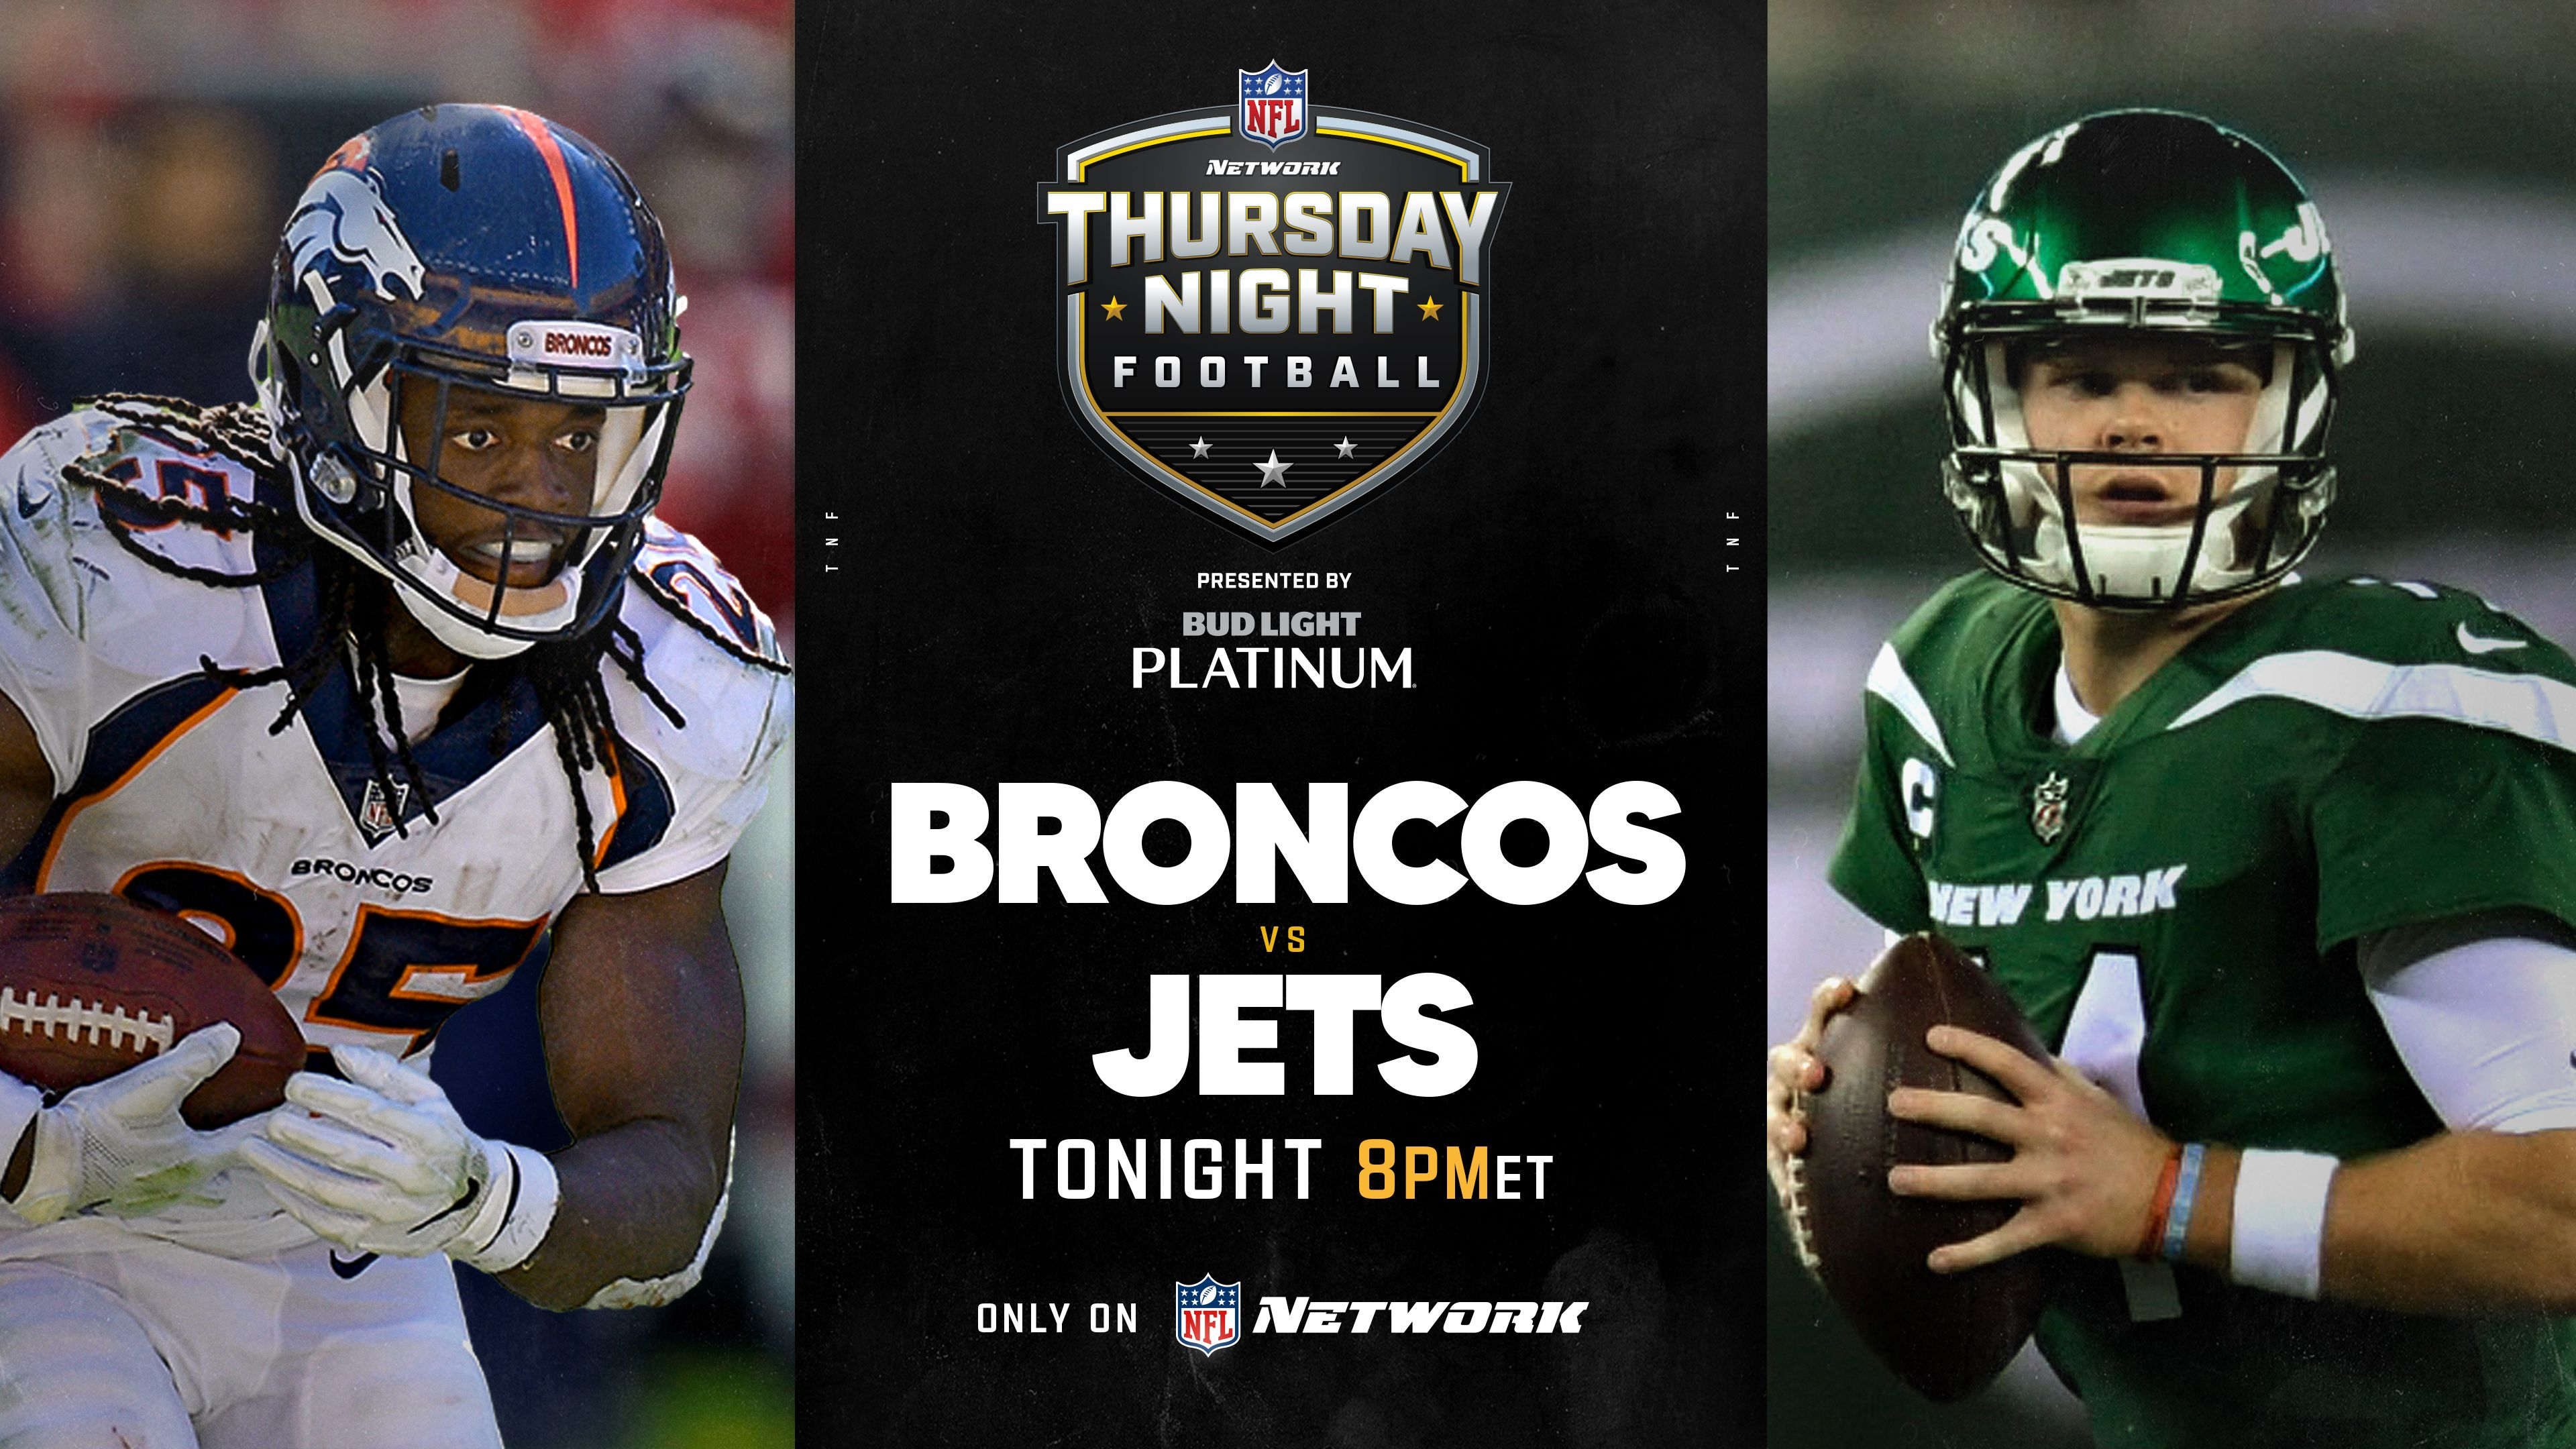 089-NFL-Network-Website-Hero-Image-3840x2160-Tonight